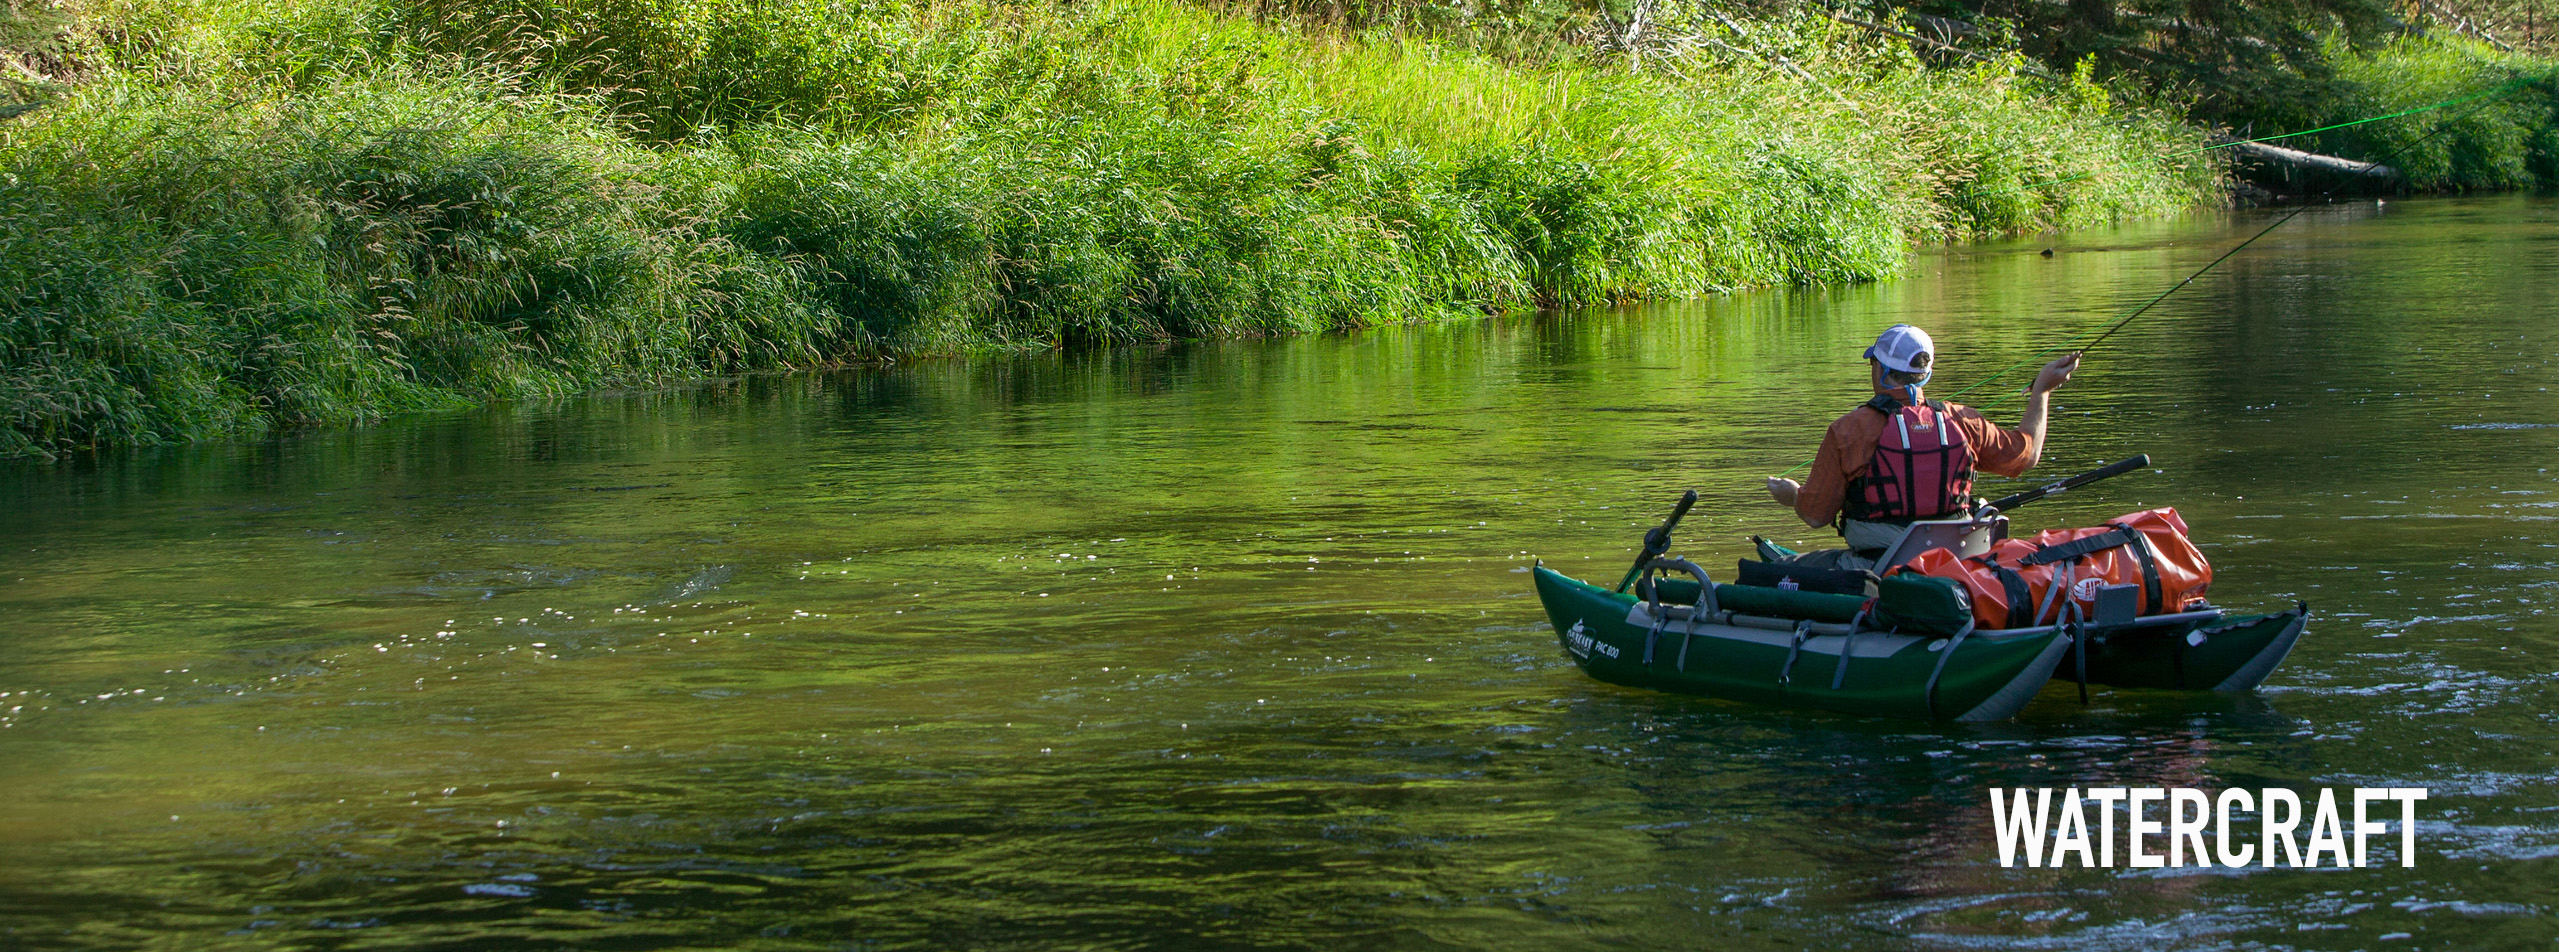 watercraft.jpg